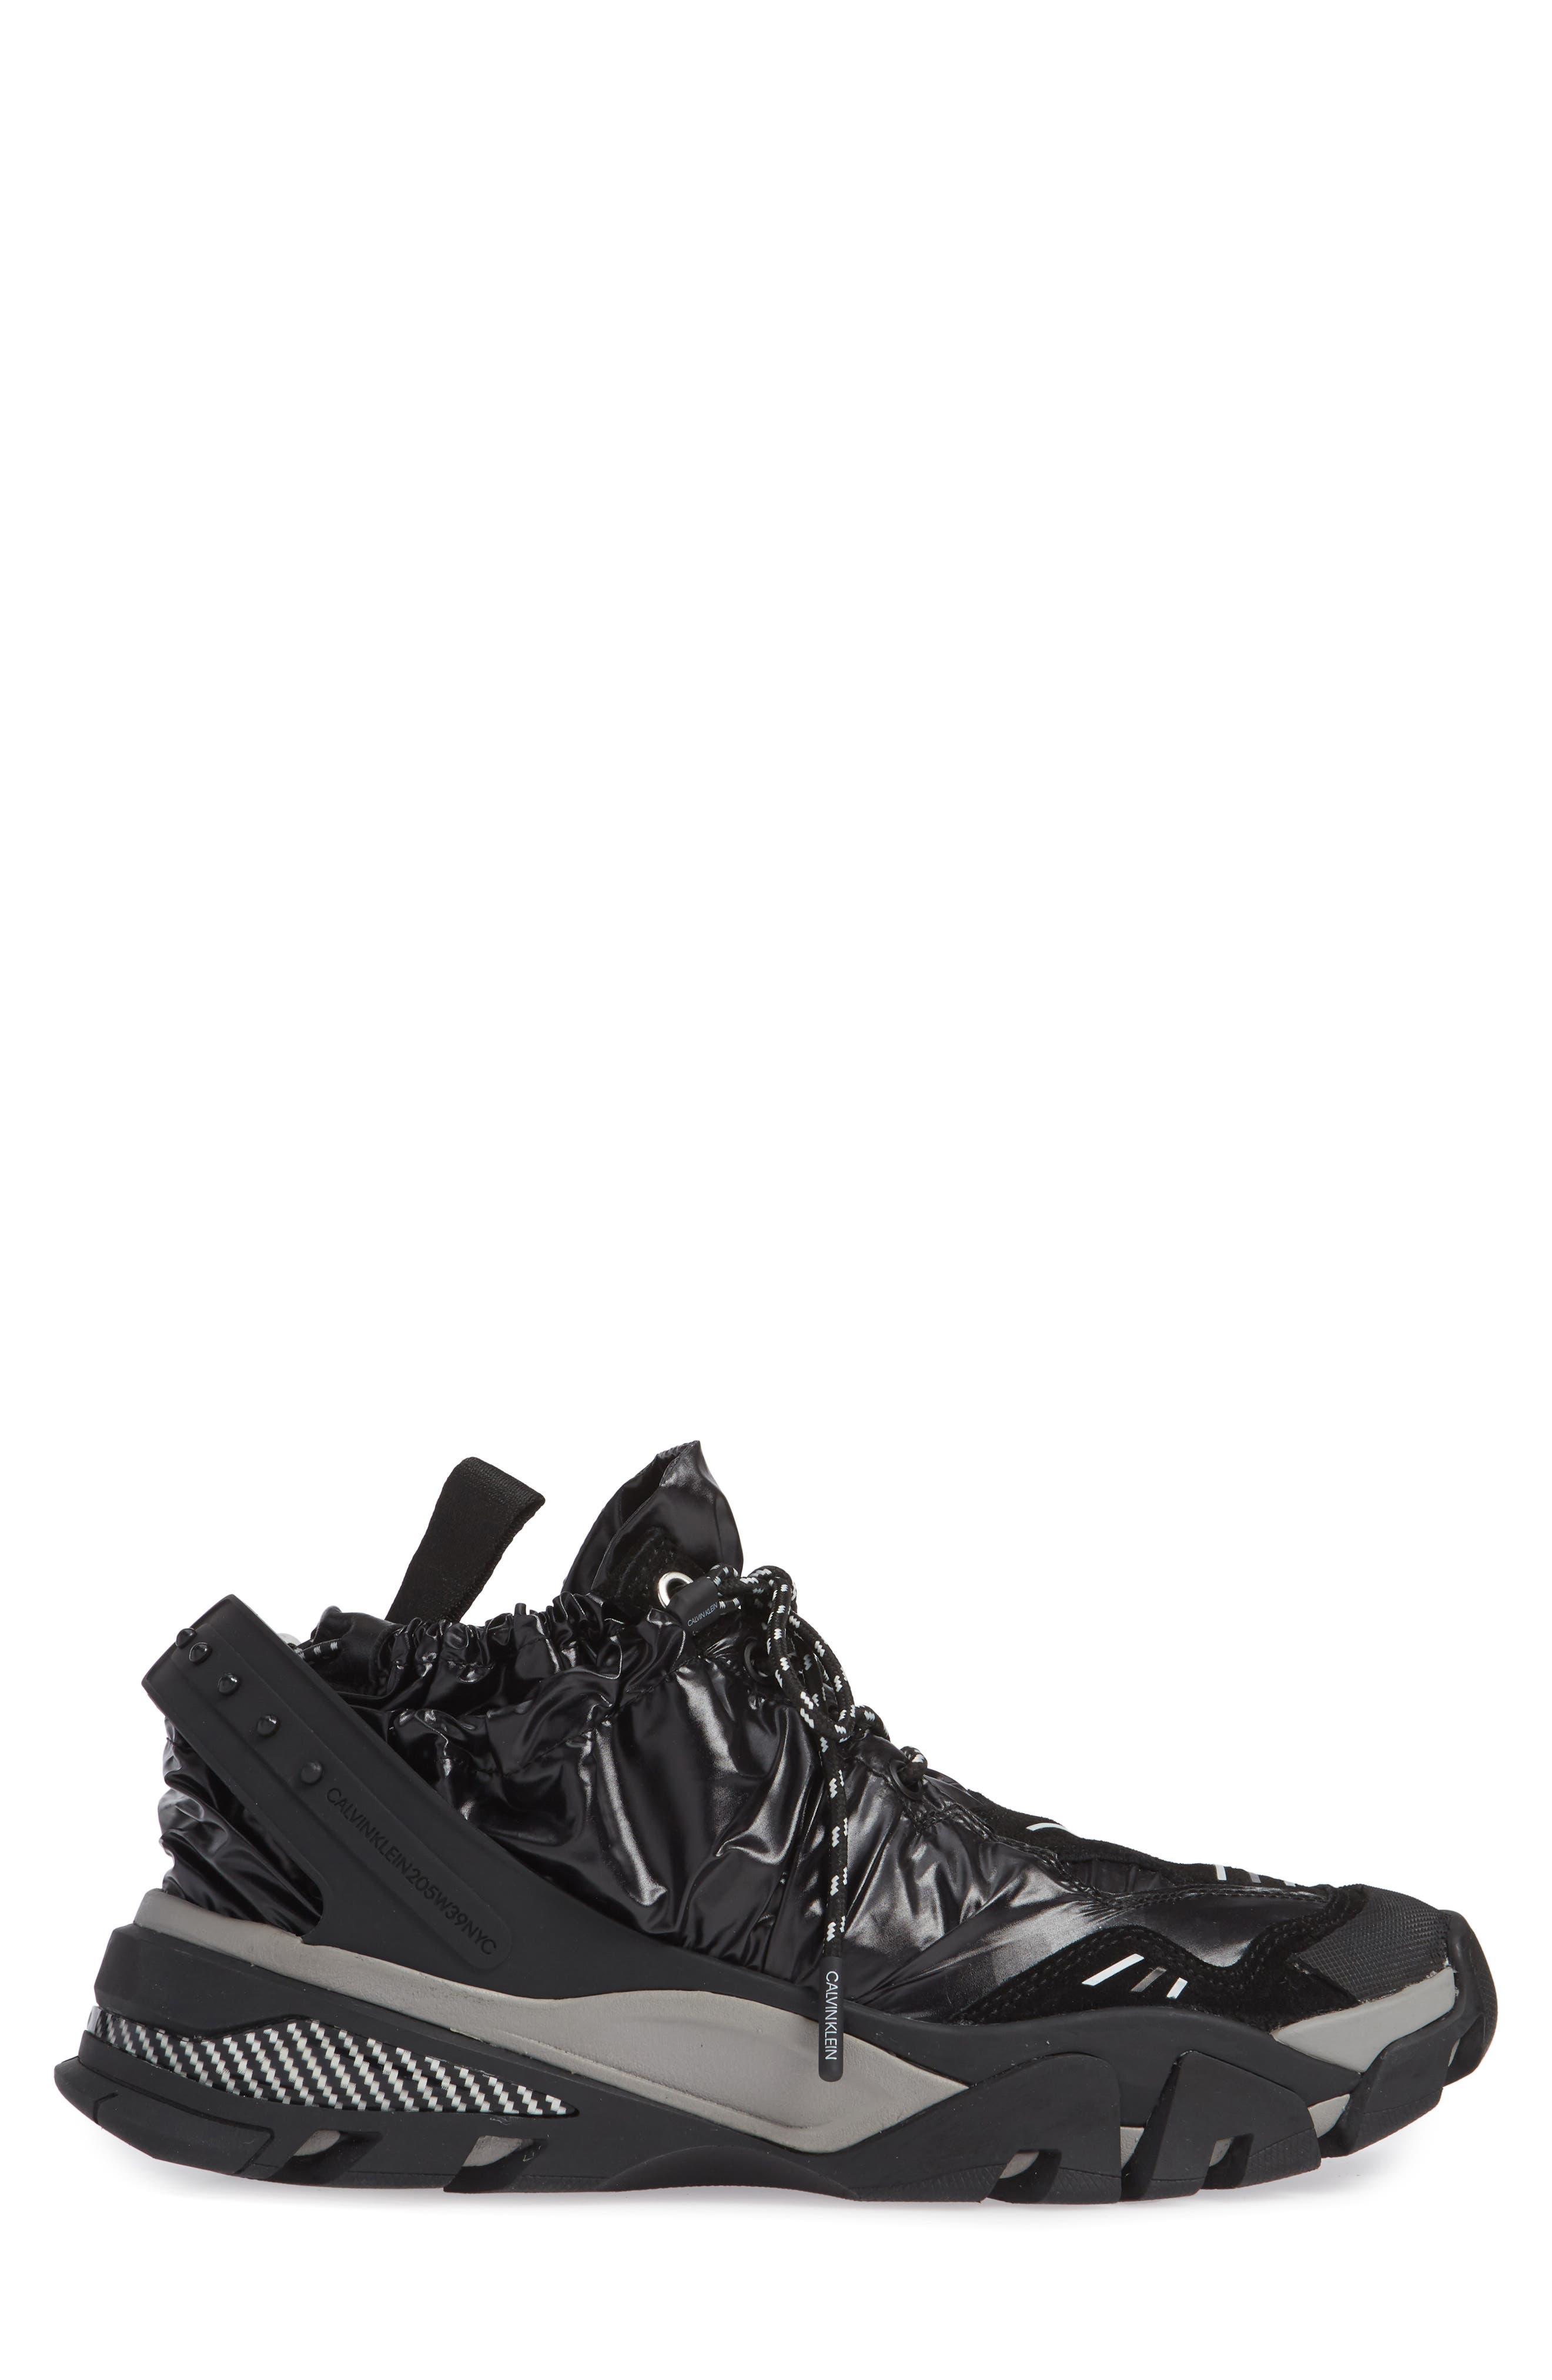 Carsdat 10 Elastic Sneaker,                             Alternate thumbnail 3, color,                             BLACK